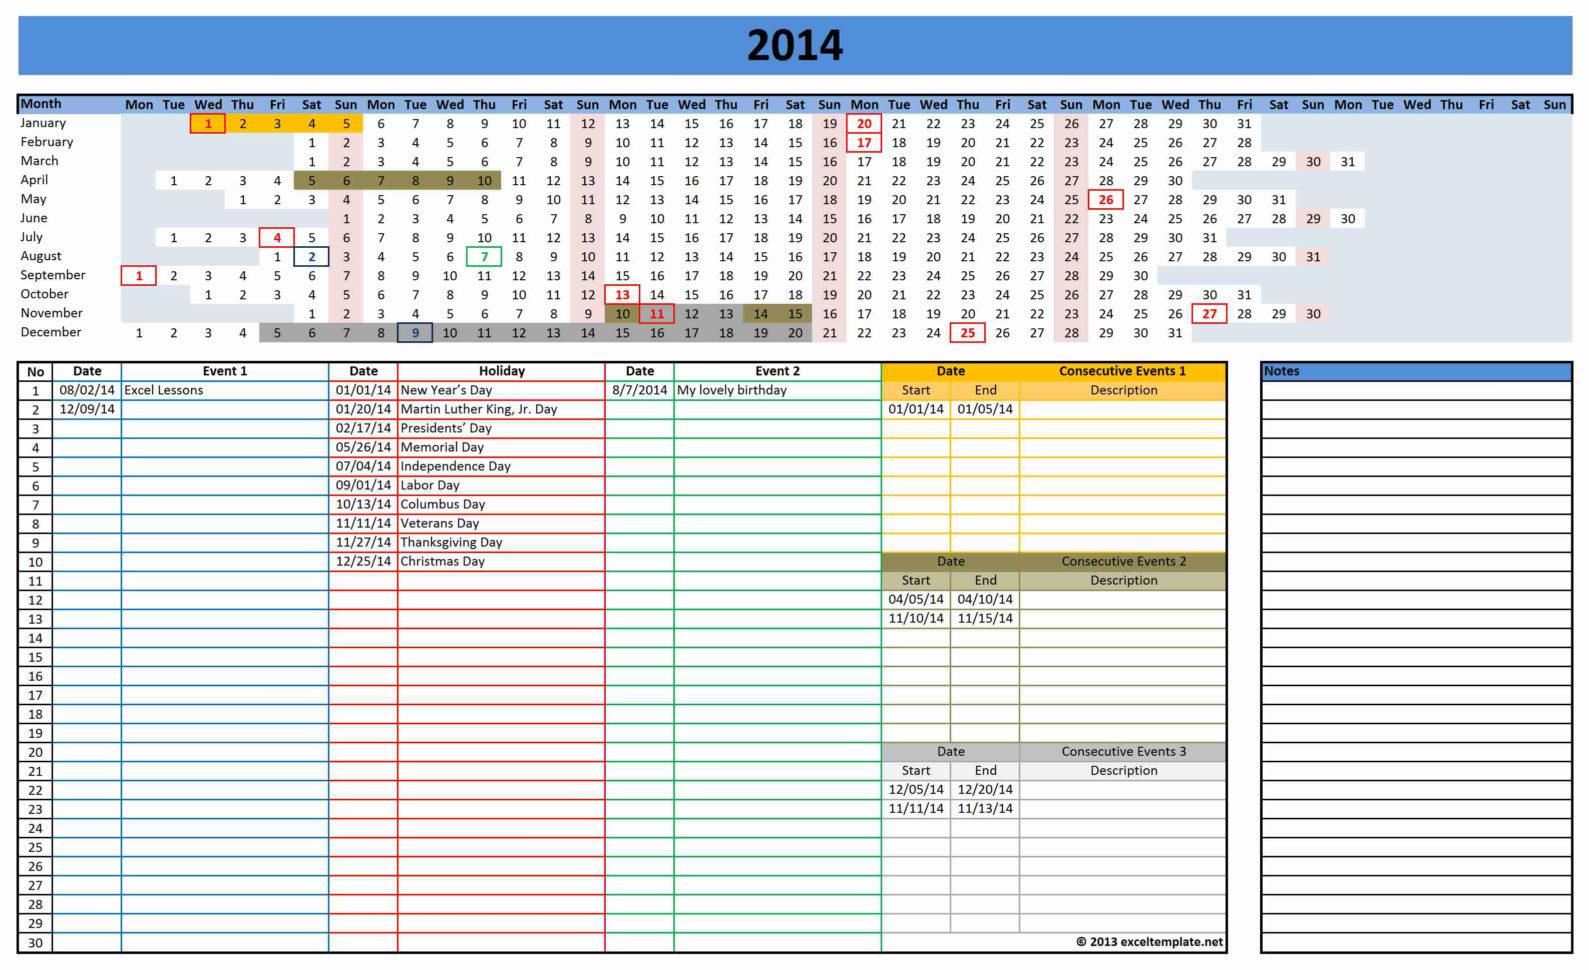 free budget calendar spreadsheet budget calendar spreadsheet budget calendar templates  Budget Calendar Spreadsheet With Budget Calendar Excel Template Budget Calendar Spreadsheet Printable Spreadshee